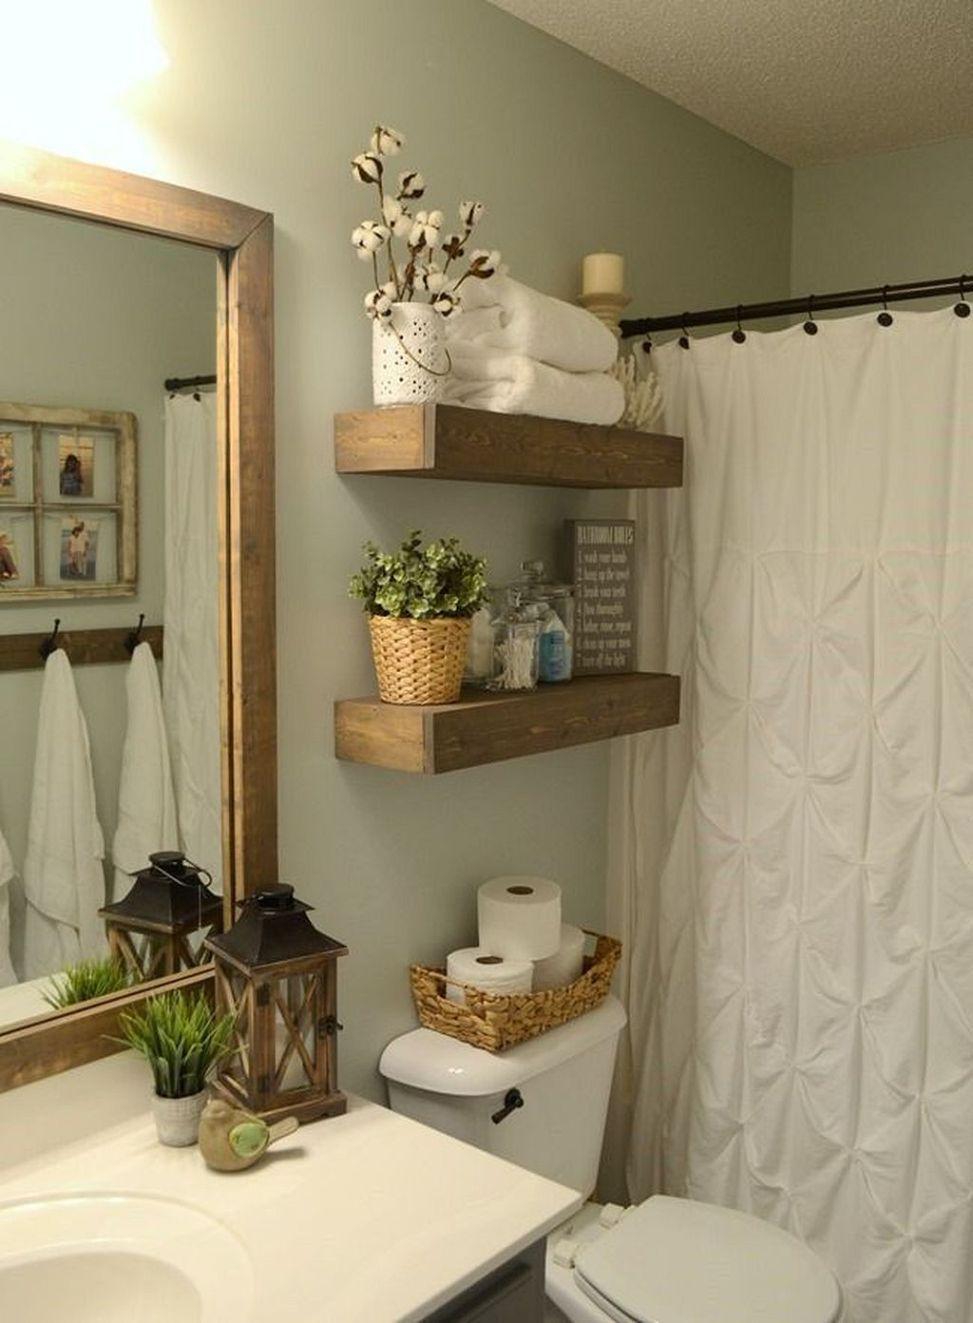 Modernes badezimmerdesign 2018 classy diy home decor rustic ideas in   diyhomedecorbathroom